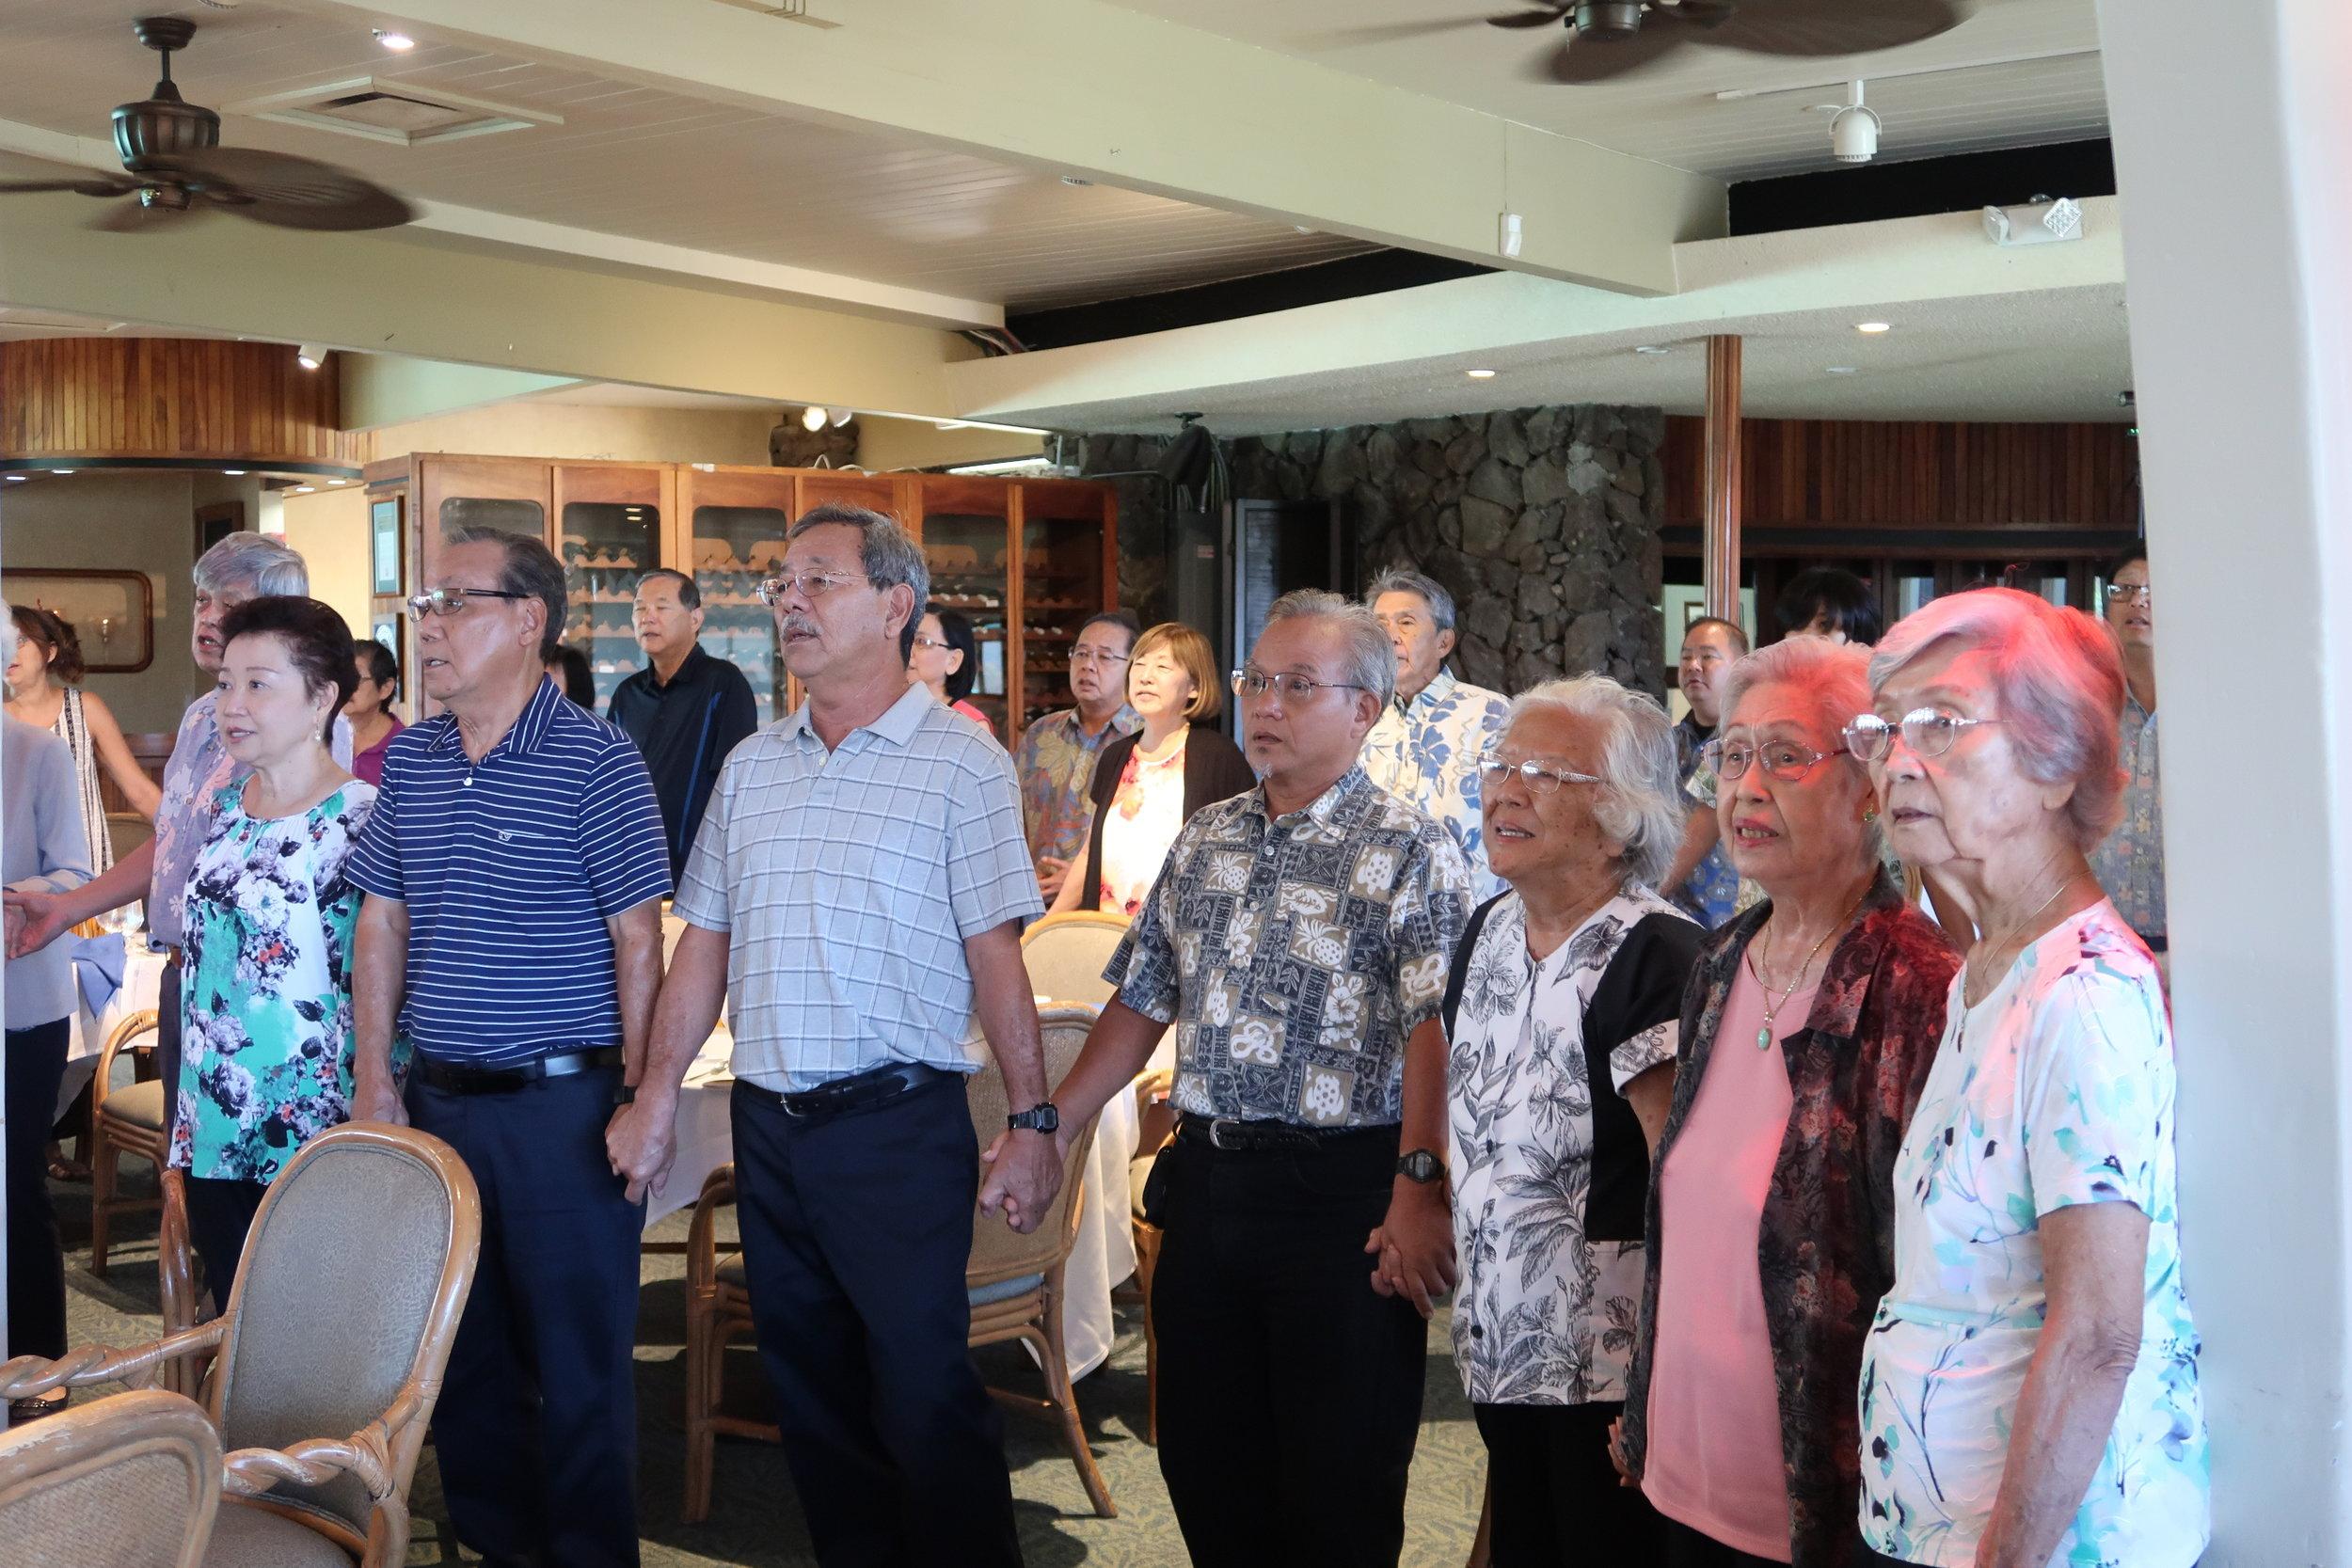 Before departing, we joined hands and sang Hawai'i Aloha